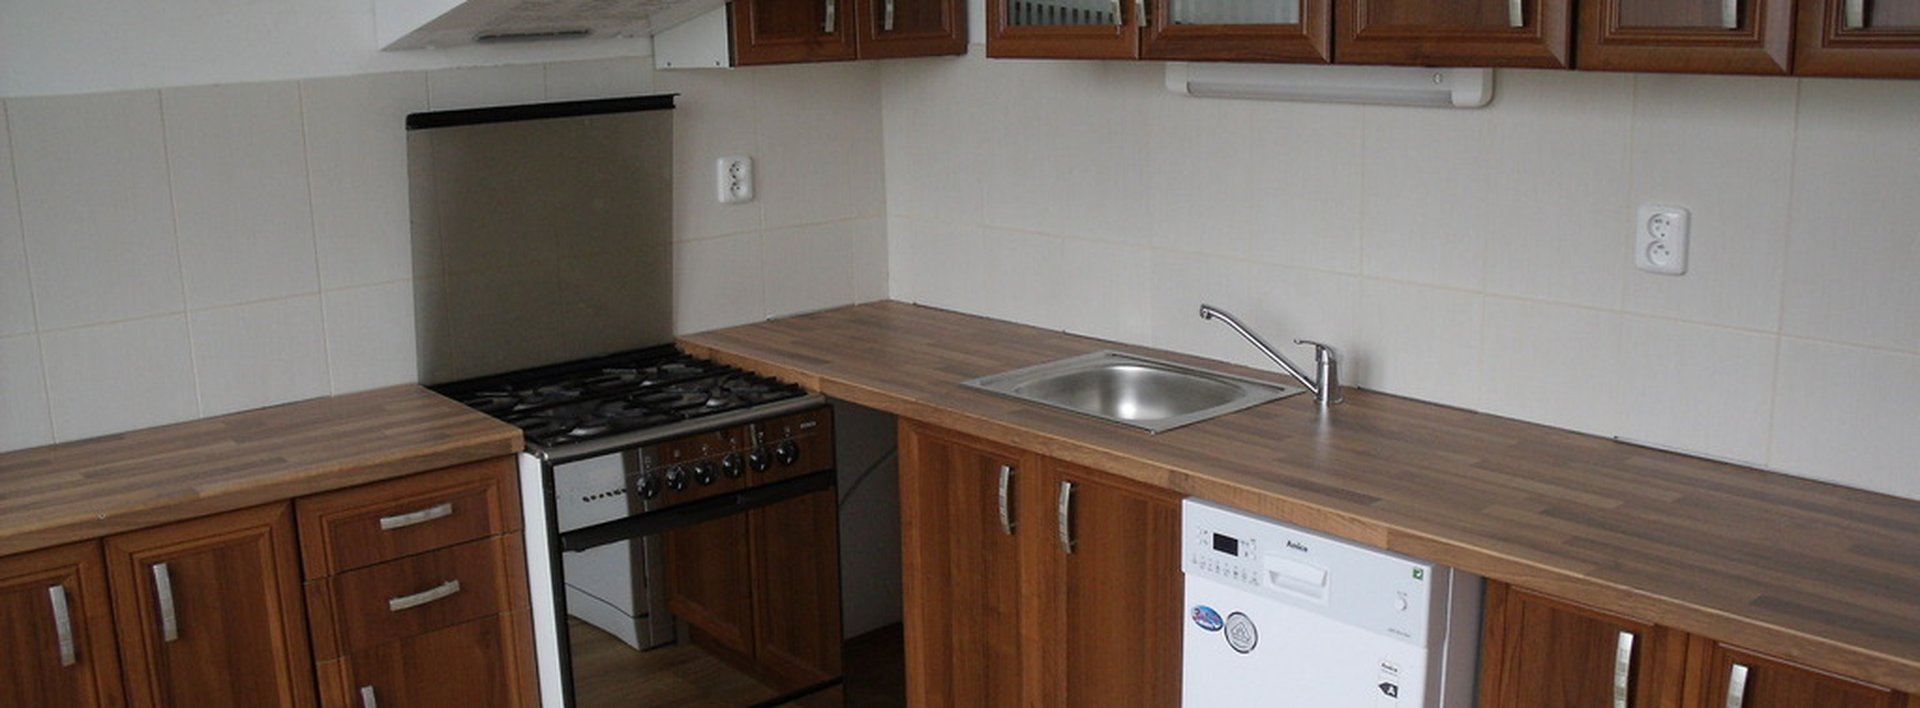 Pronájem hezkého, prostorného bytu 2+1/L a komorou, Liberec - Dolní Hanychov, Ev.č.: N46775